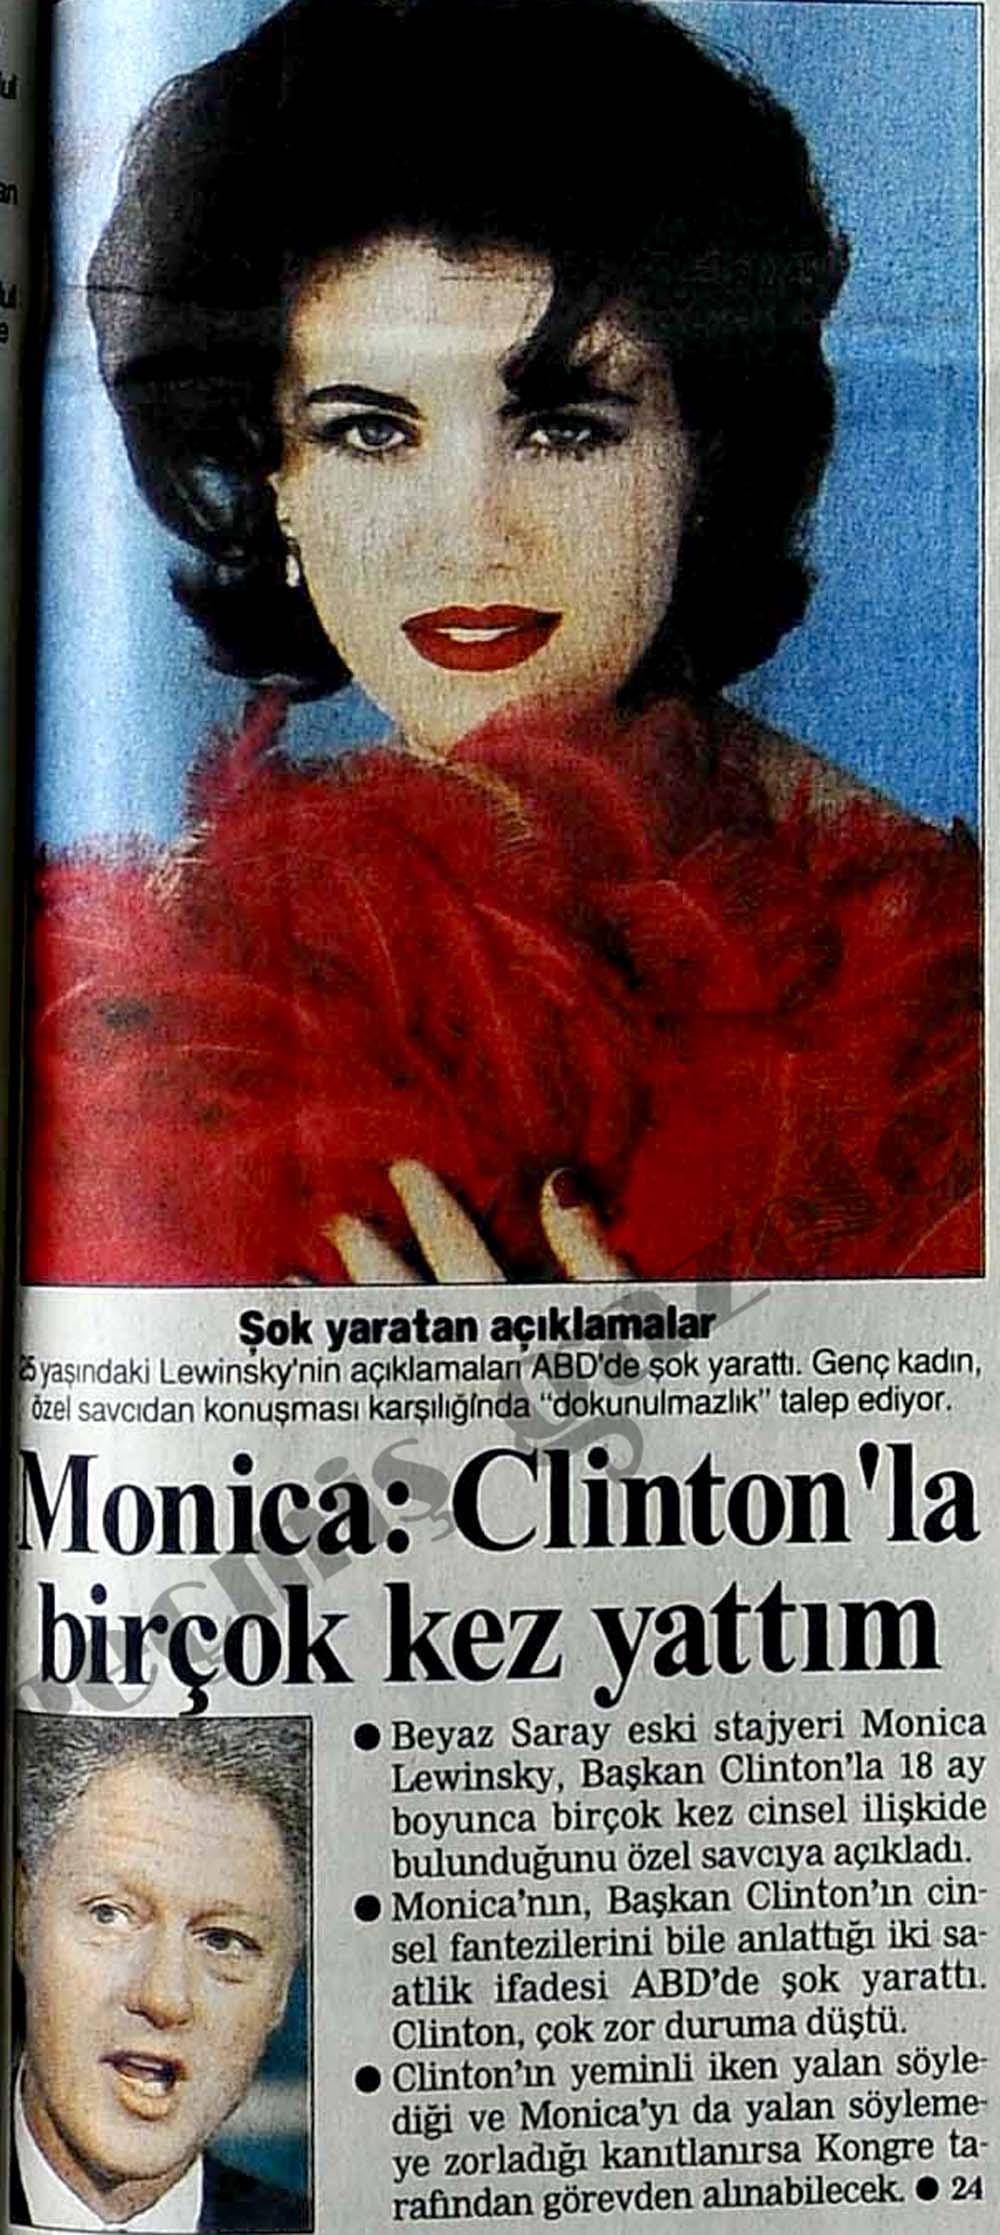 Monica: Clinton'la birçok kez yattım